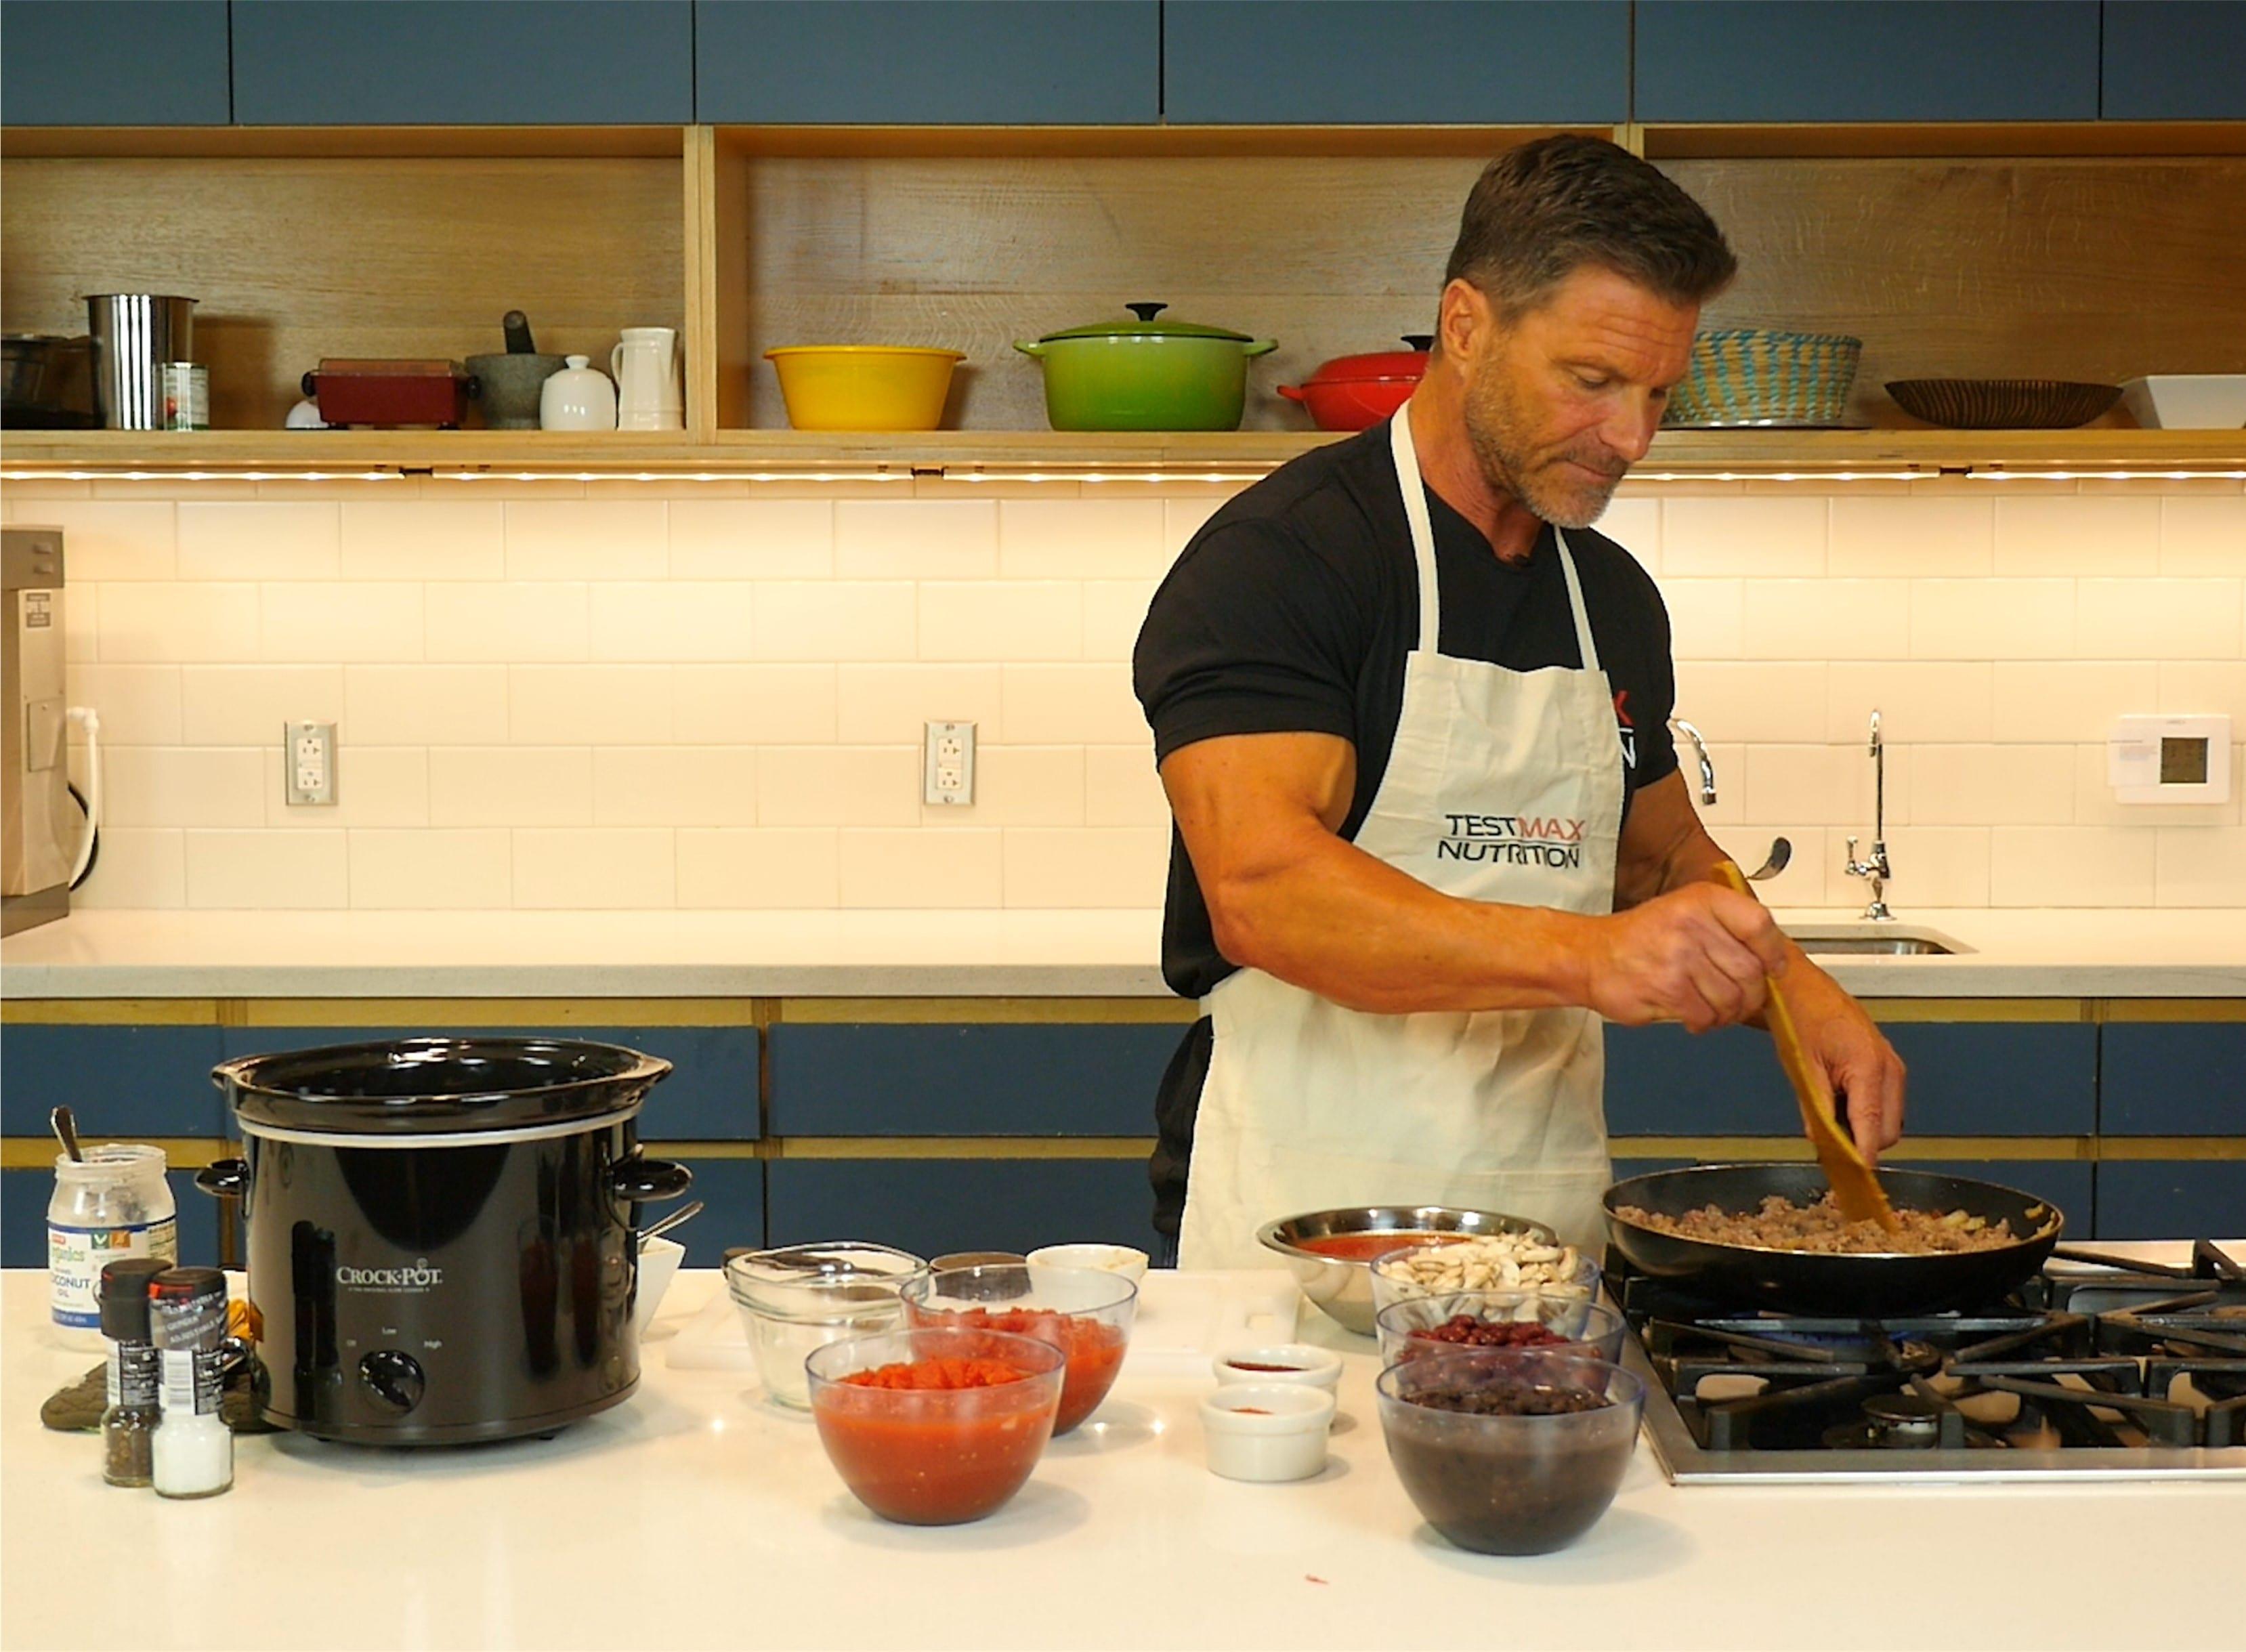 Clark Bartram's Testosterone-Boosting Chili Recipe - Where